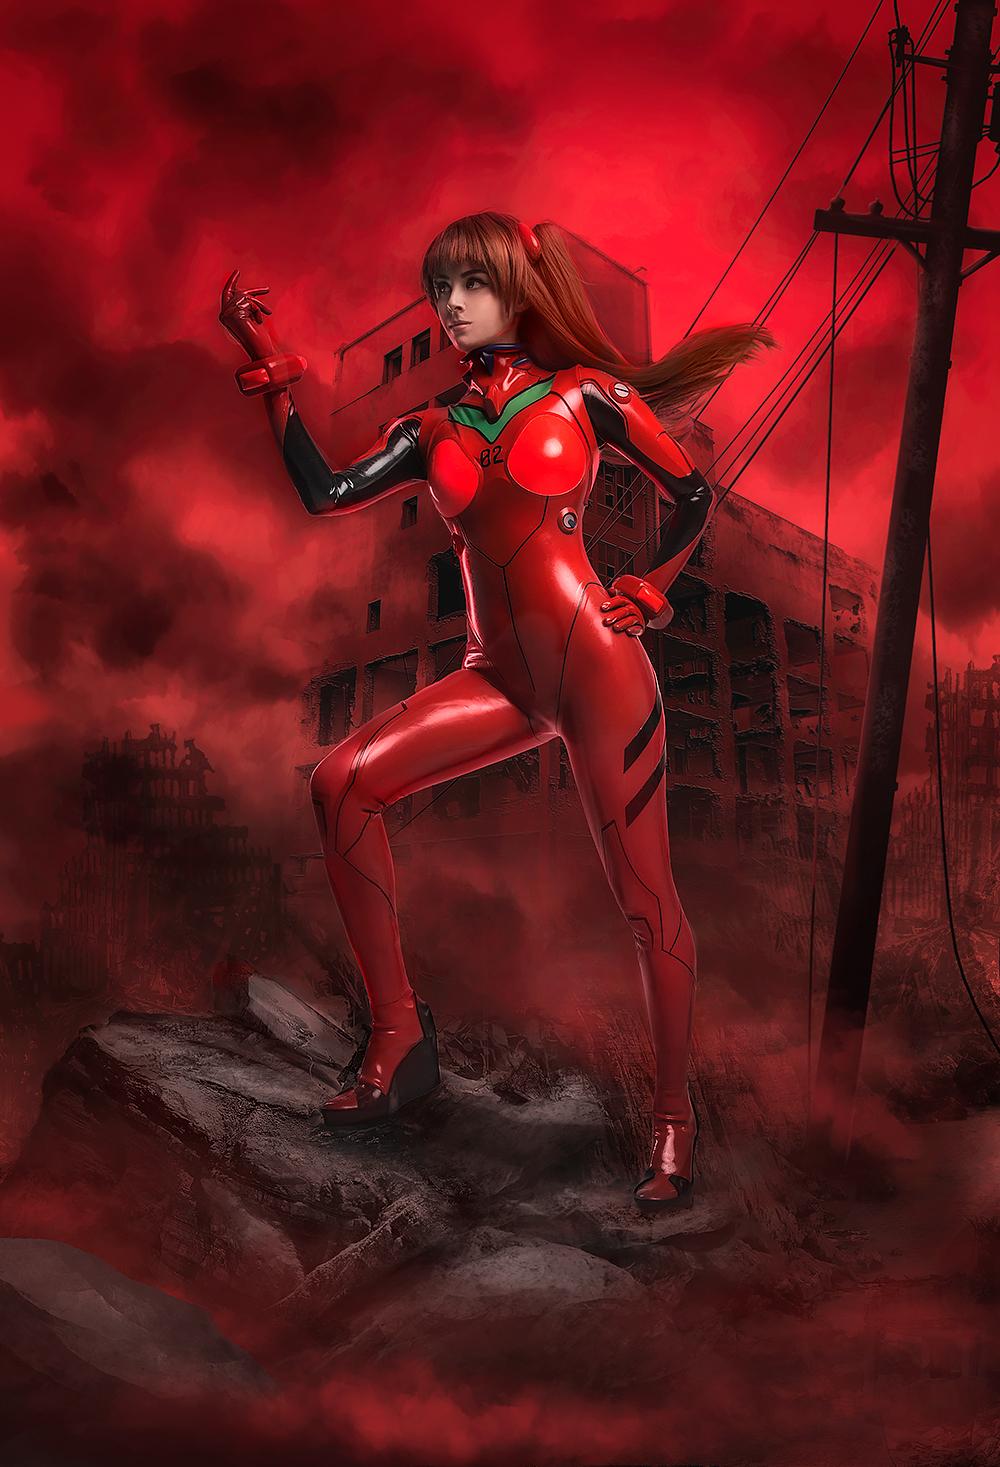 Neon Genesis Evangelion - Asuka Langley cosplay by Disharmonica